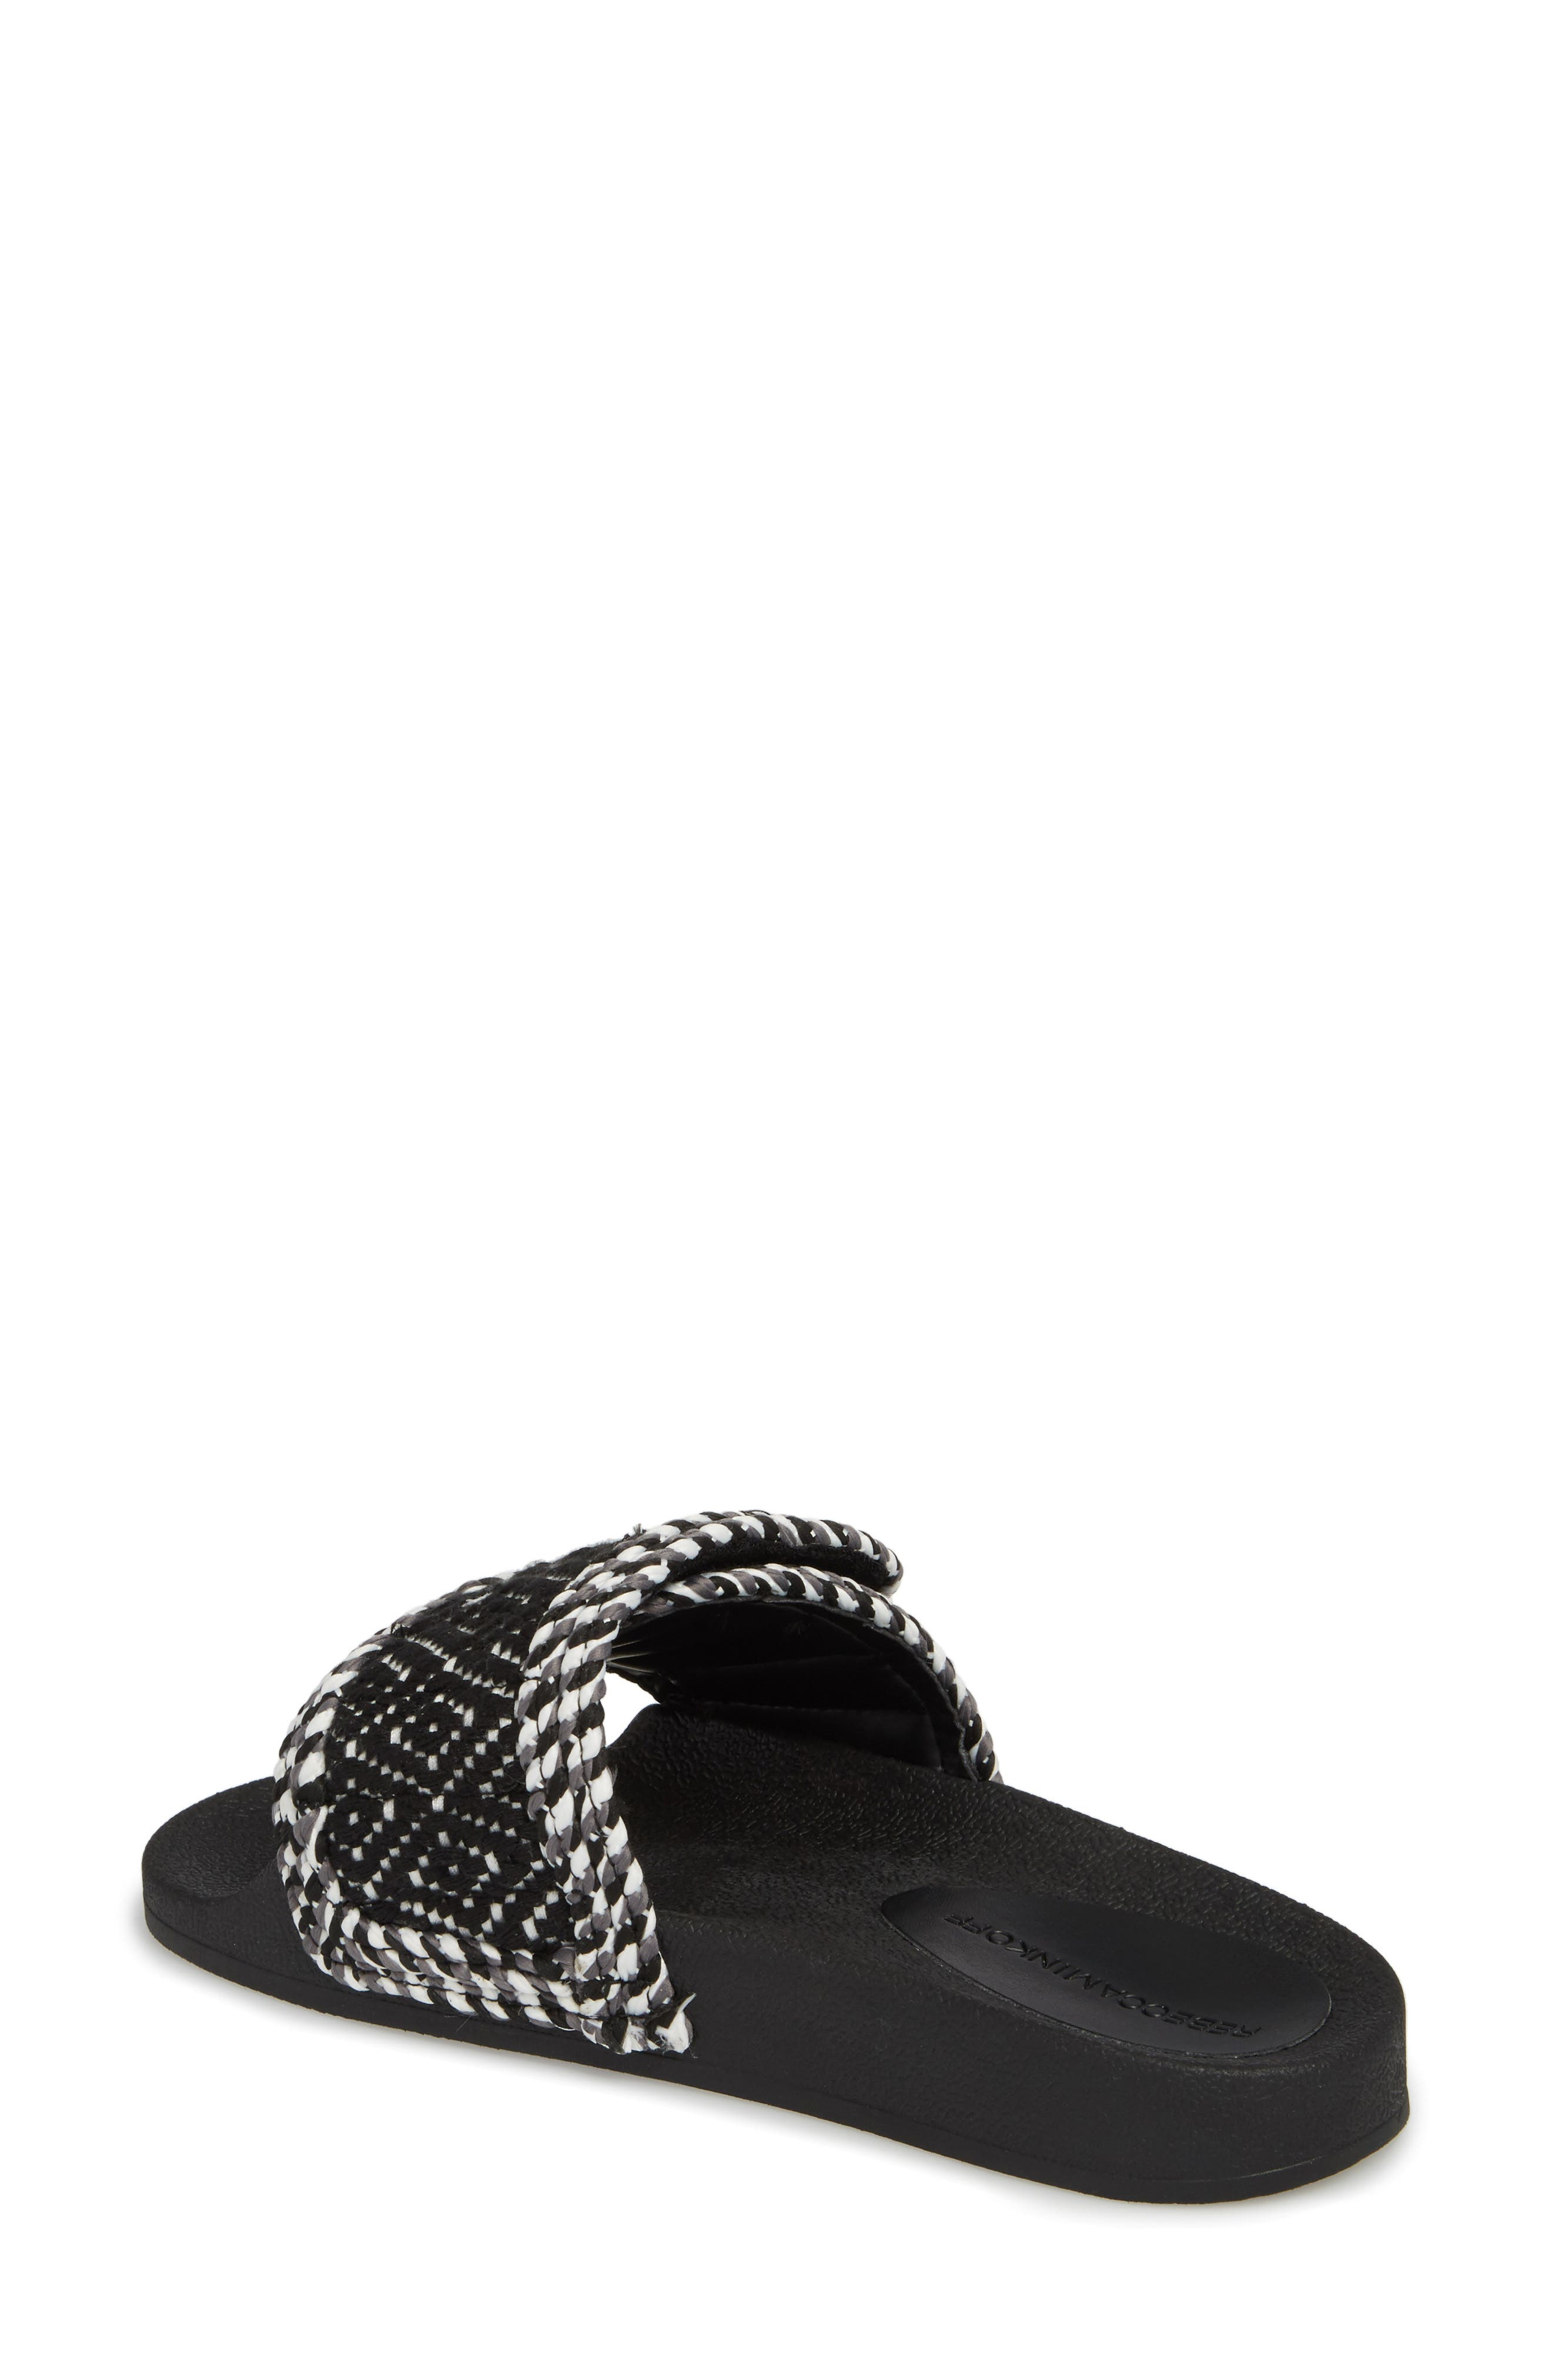 Tressa Woven Slide Sandal,                             Alternate thumbnail 2, color,                             Black/ White Woven Fabric